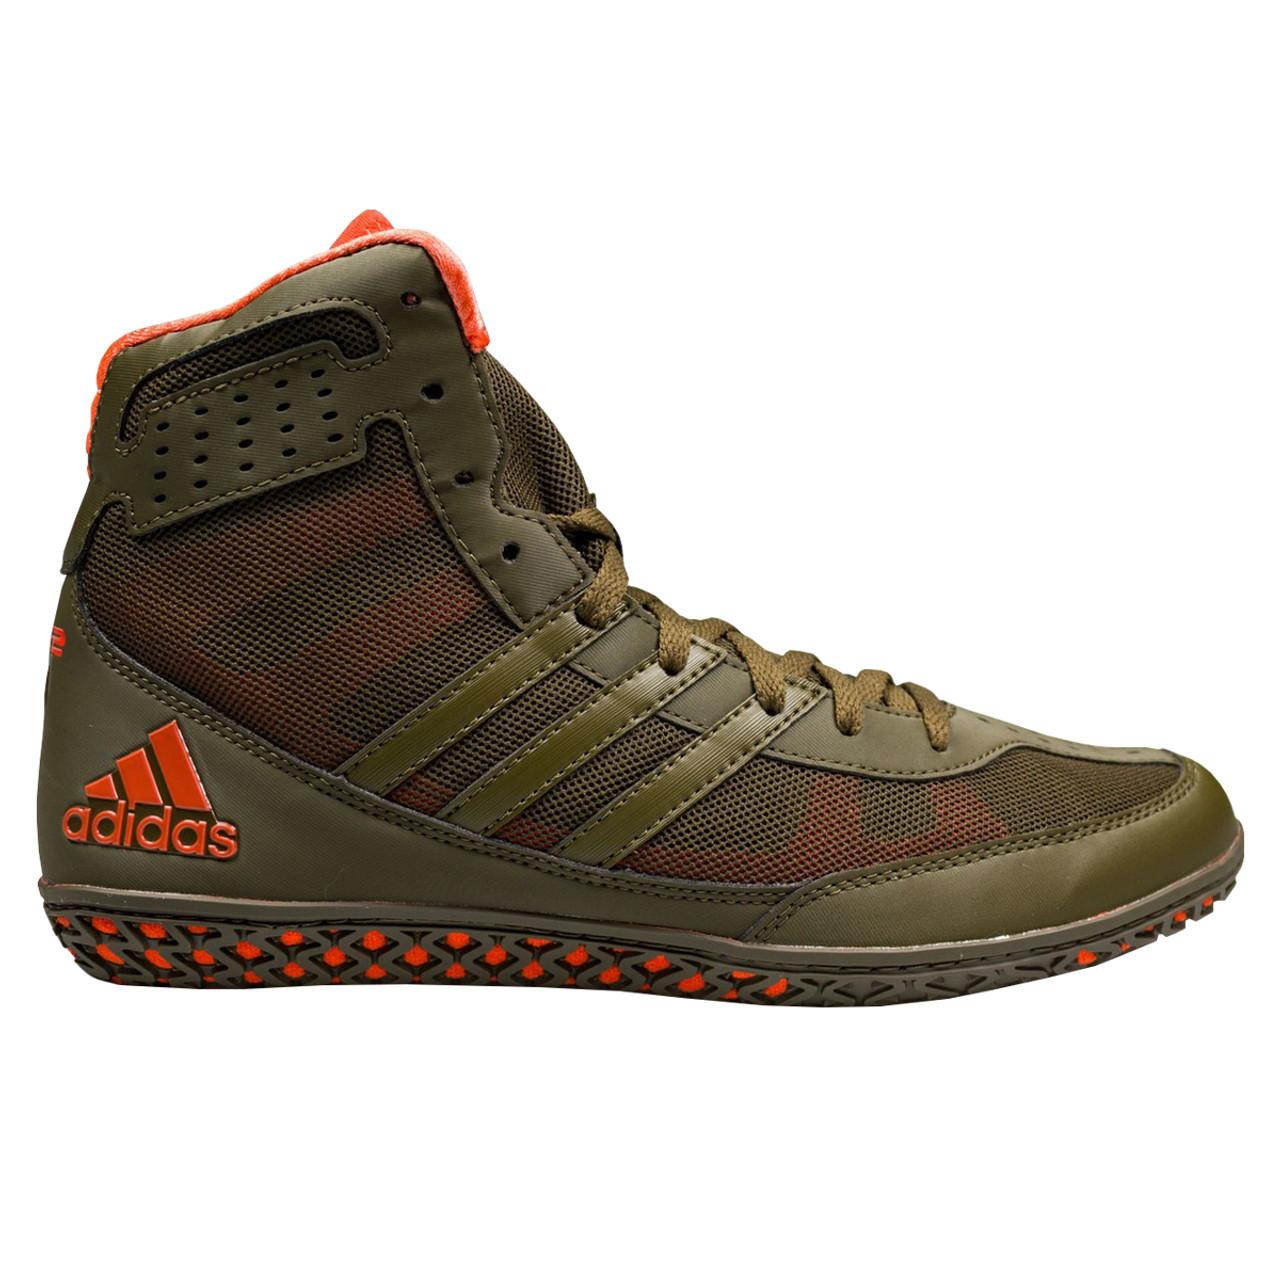 6f129849 Adidas Mat Wizard 3 Senior Wrestling Shoes BB3297 - Olive, Orange ...